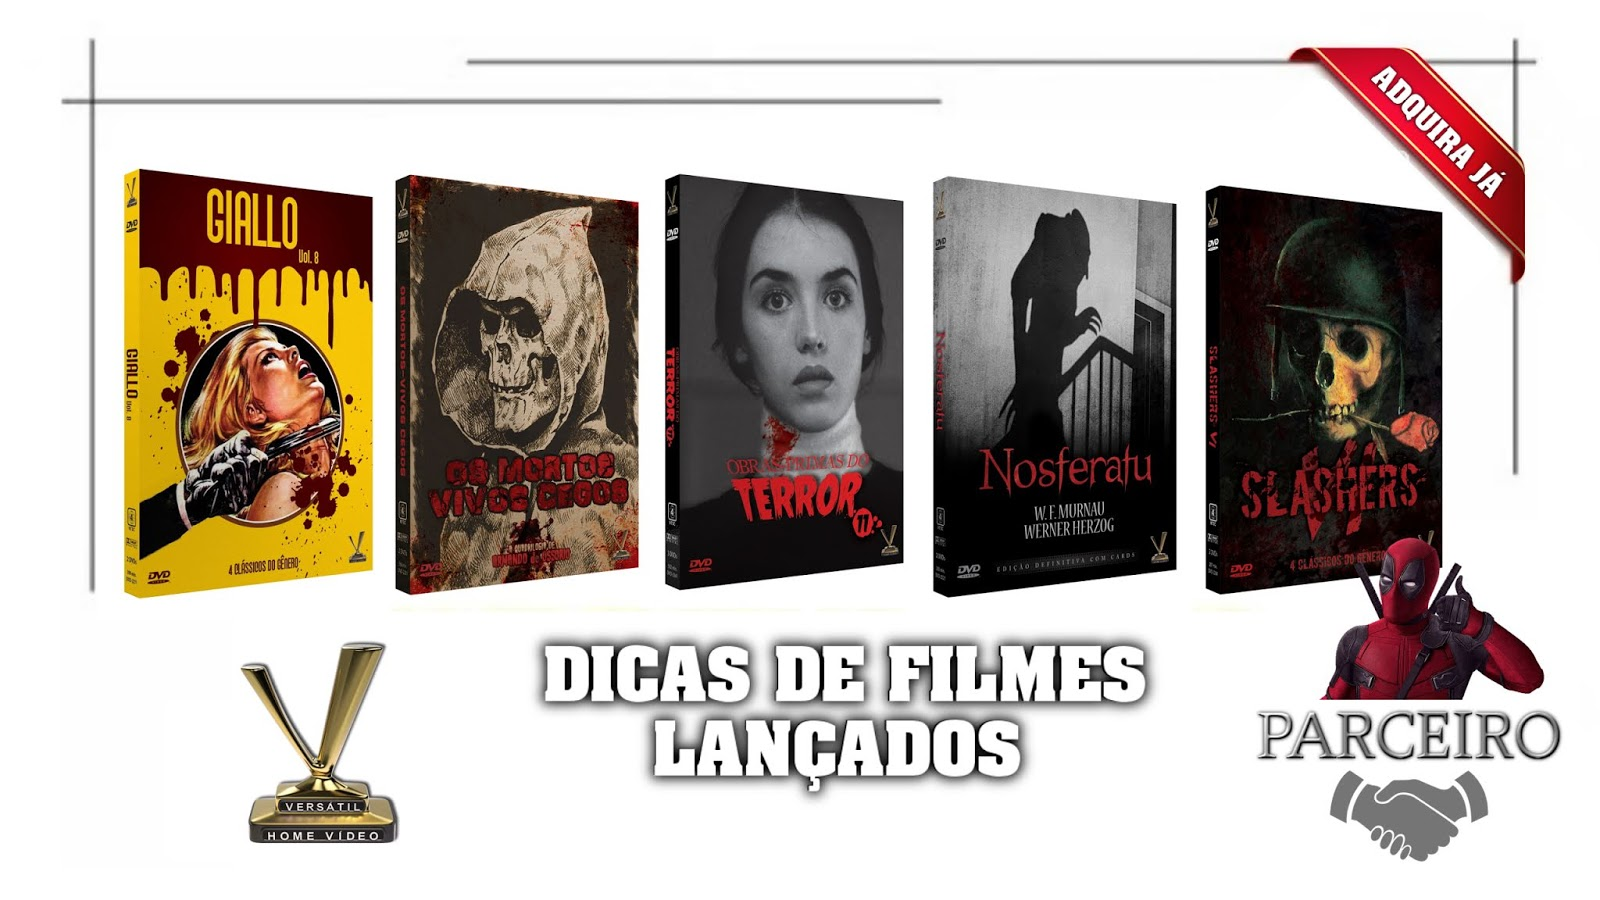 dvd-versatil-novembro